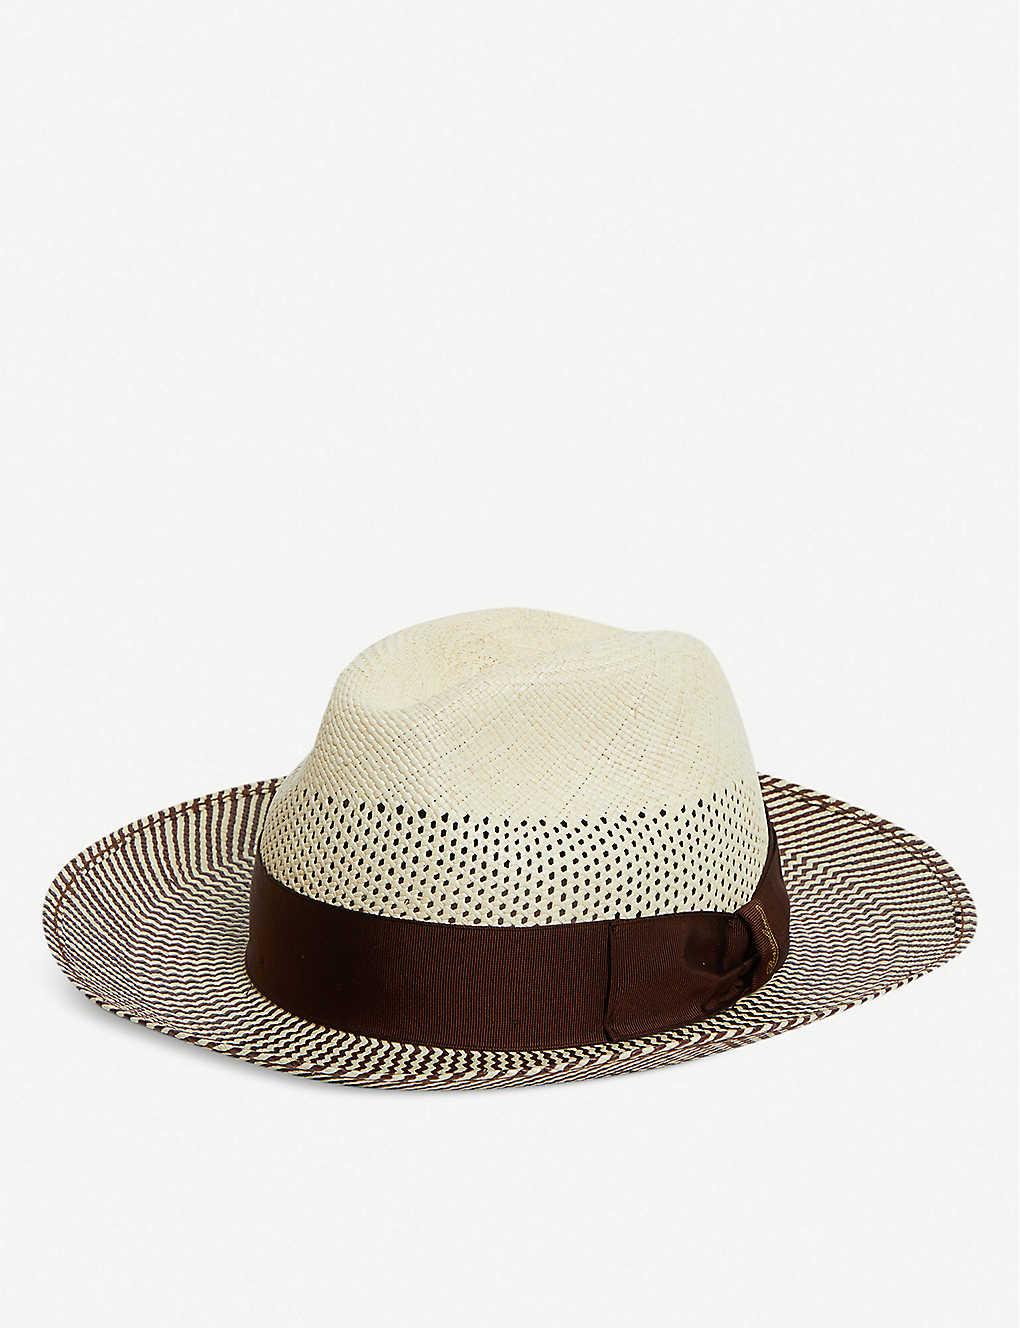 82a4411d1891c3 BORSALINO - Two-tone straw Panama hat | Selfridges.com